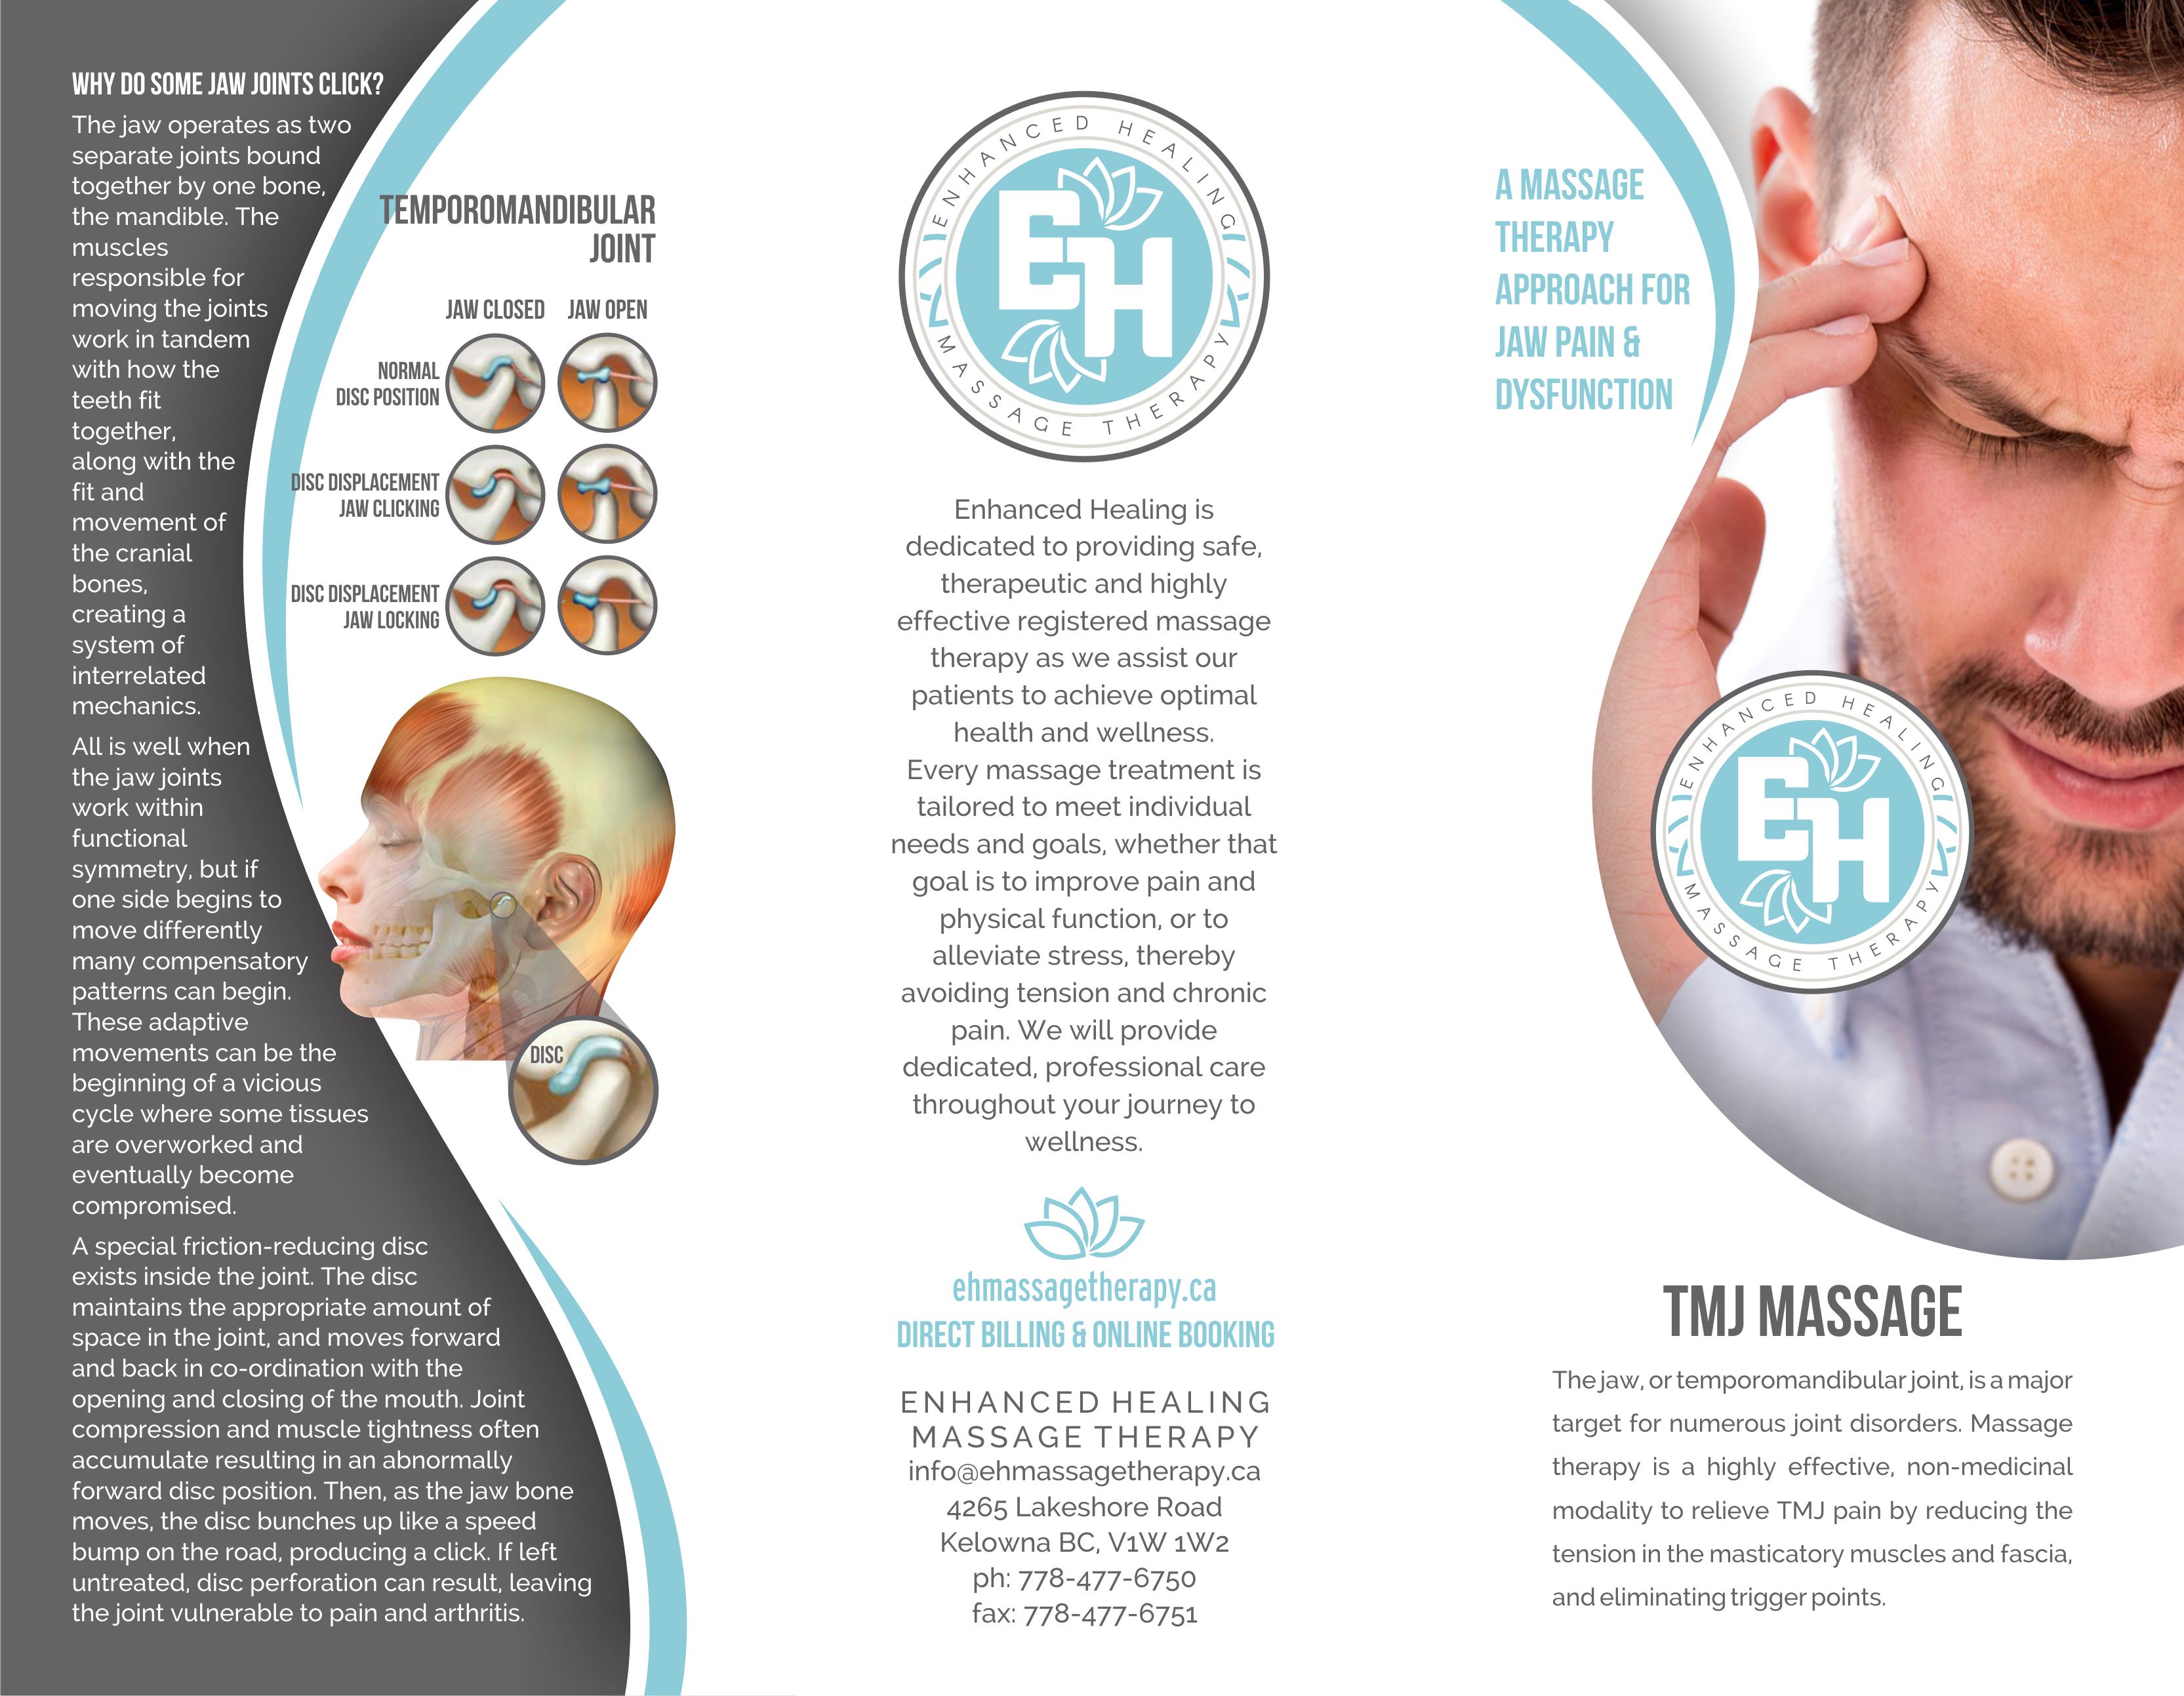 TMJ Dysfunction brochure (outside)